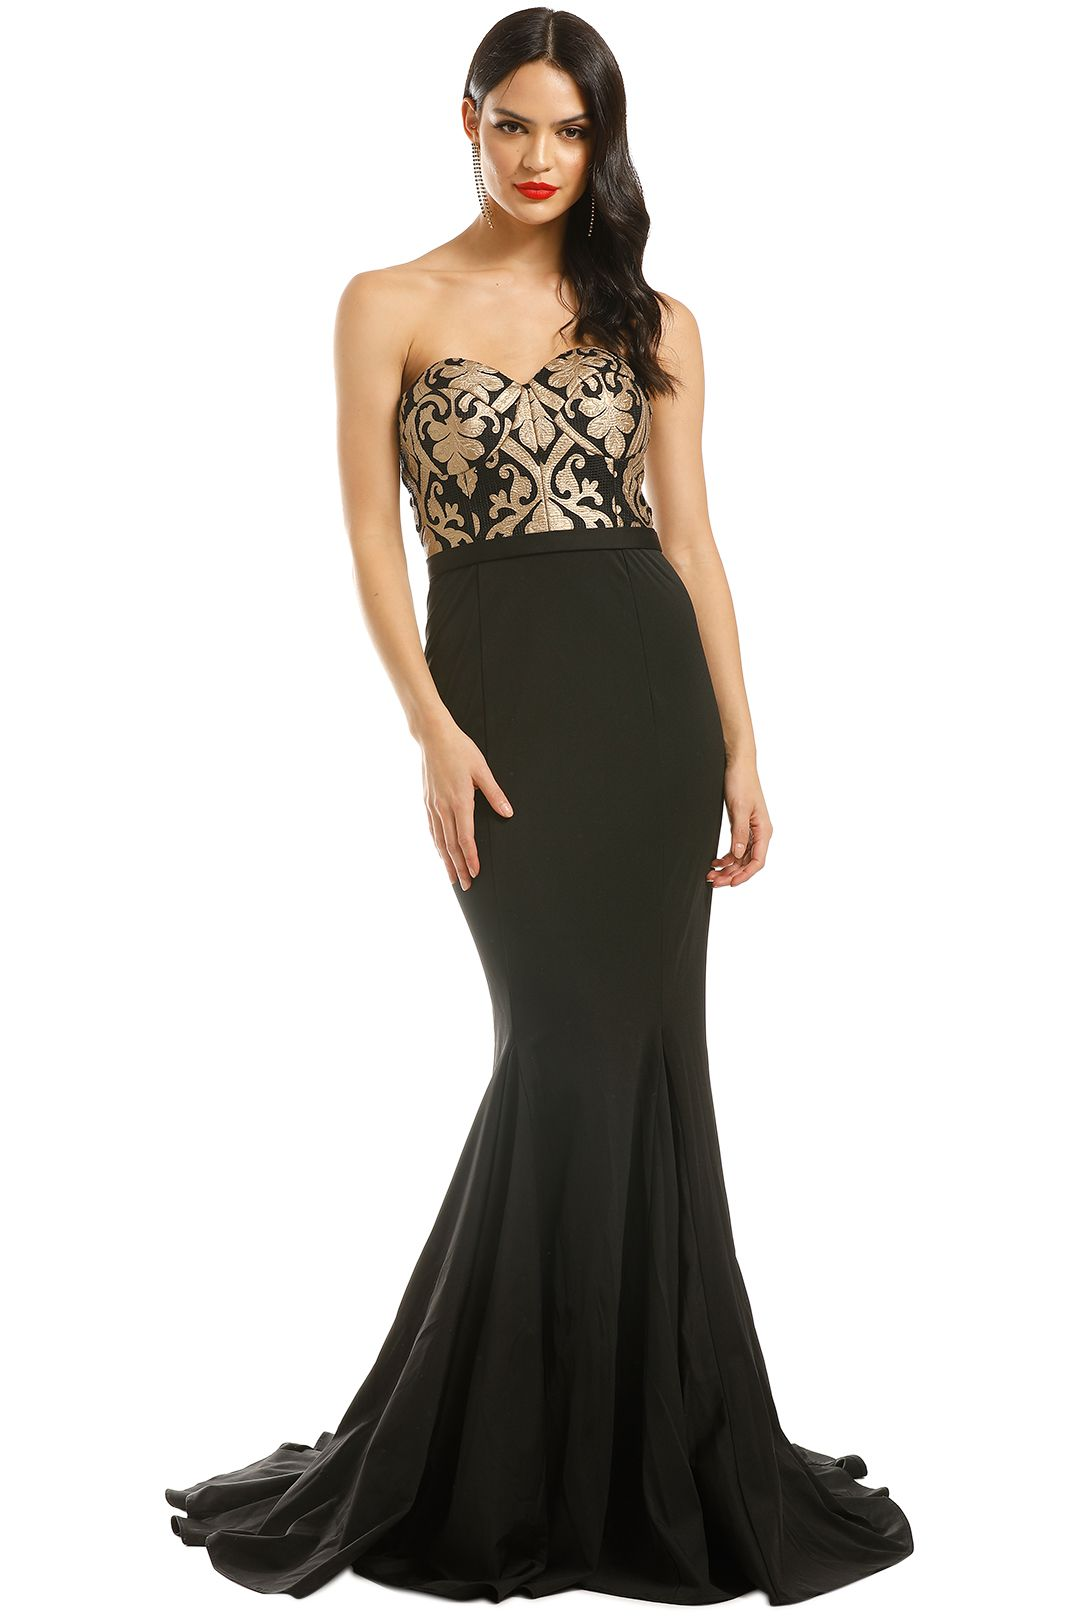 Jadore-Elsa-Gown-Gold-Black-Front